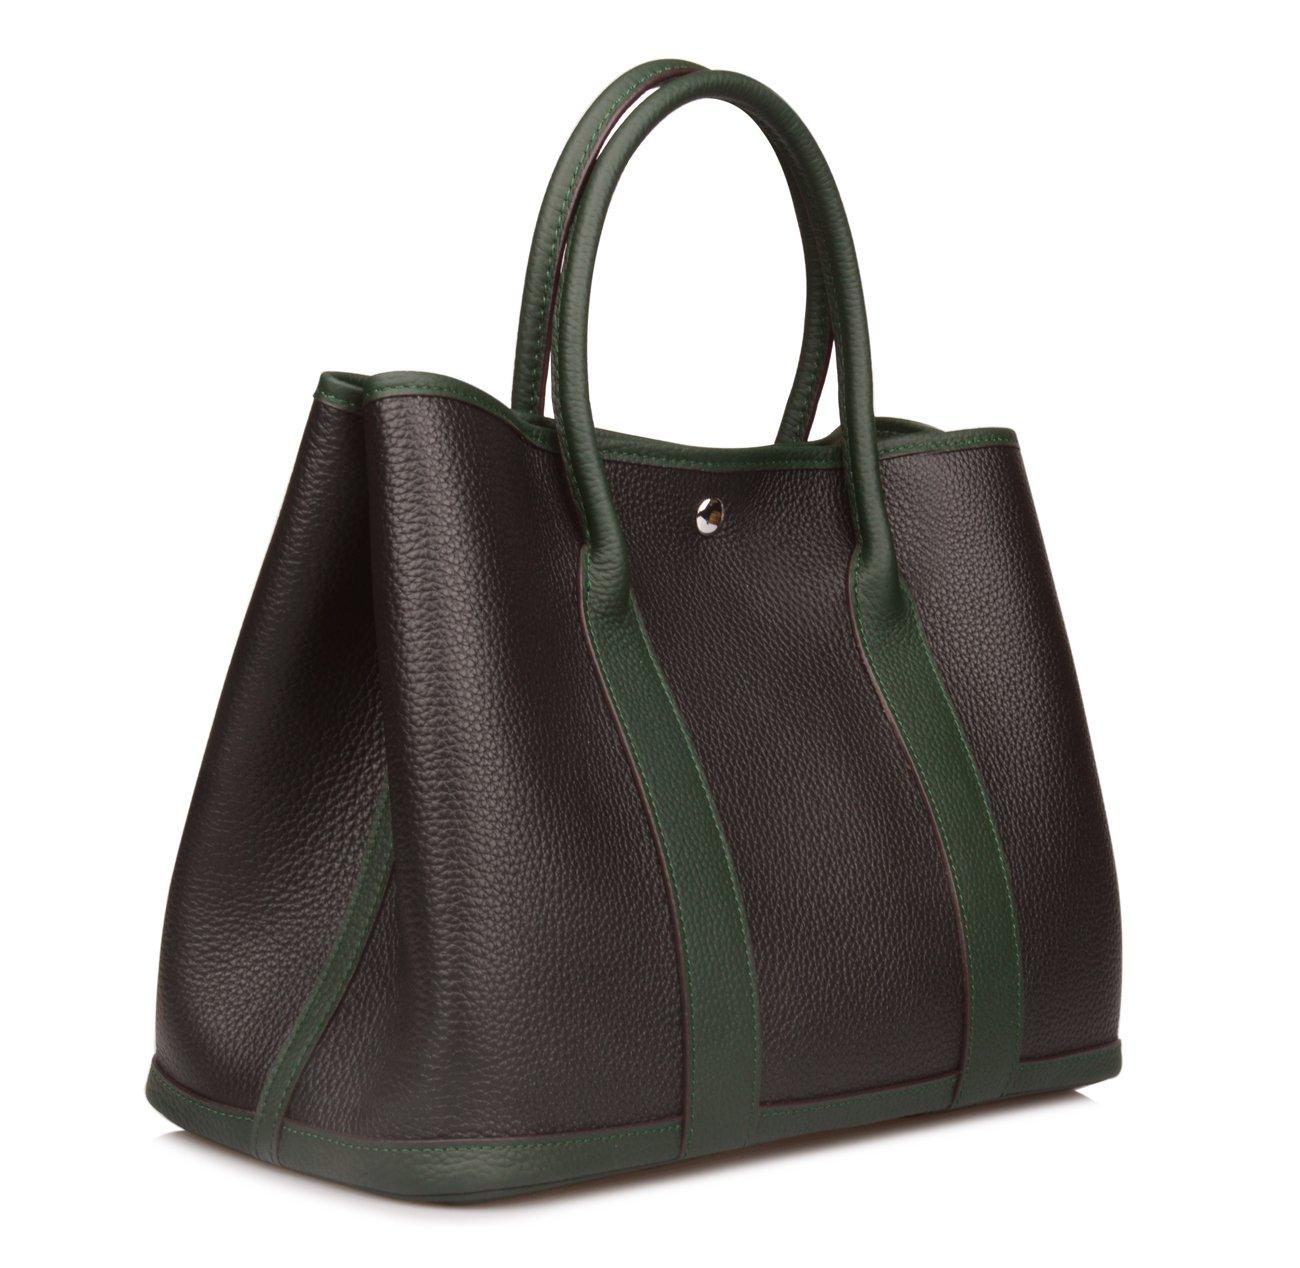 Ainifeel Women's Genuine Leather Top Handle Handbag Shopping Bag Tote Bag (Black/green)